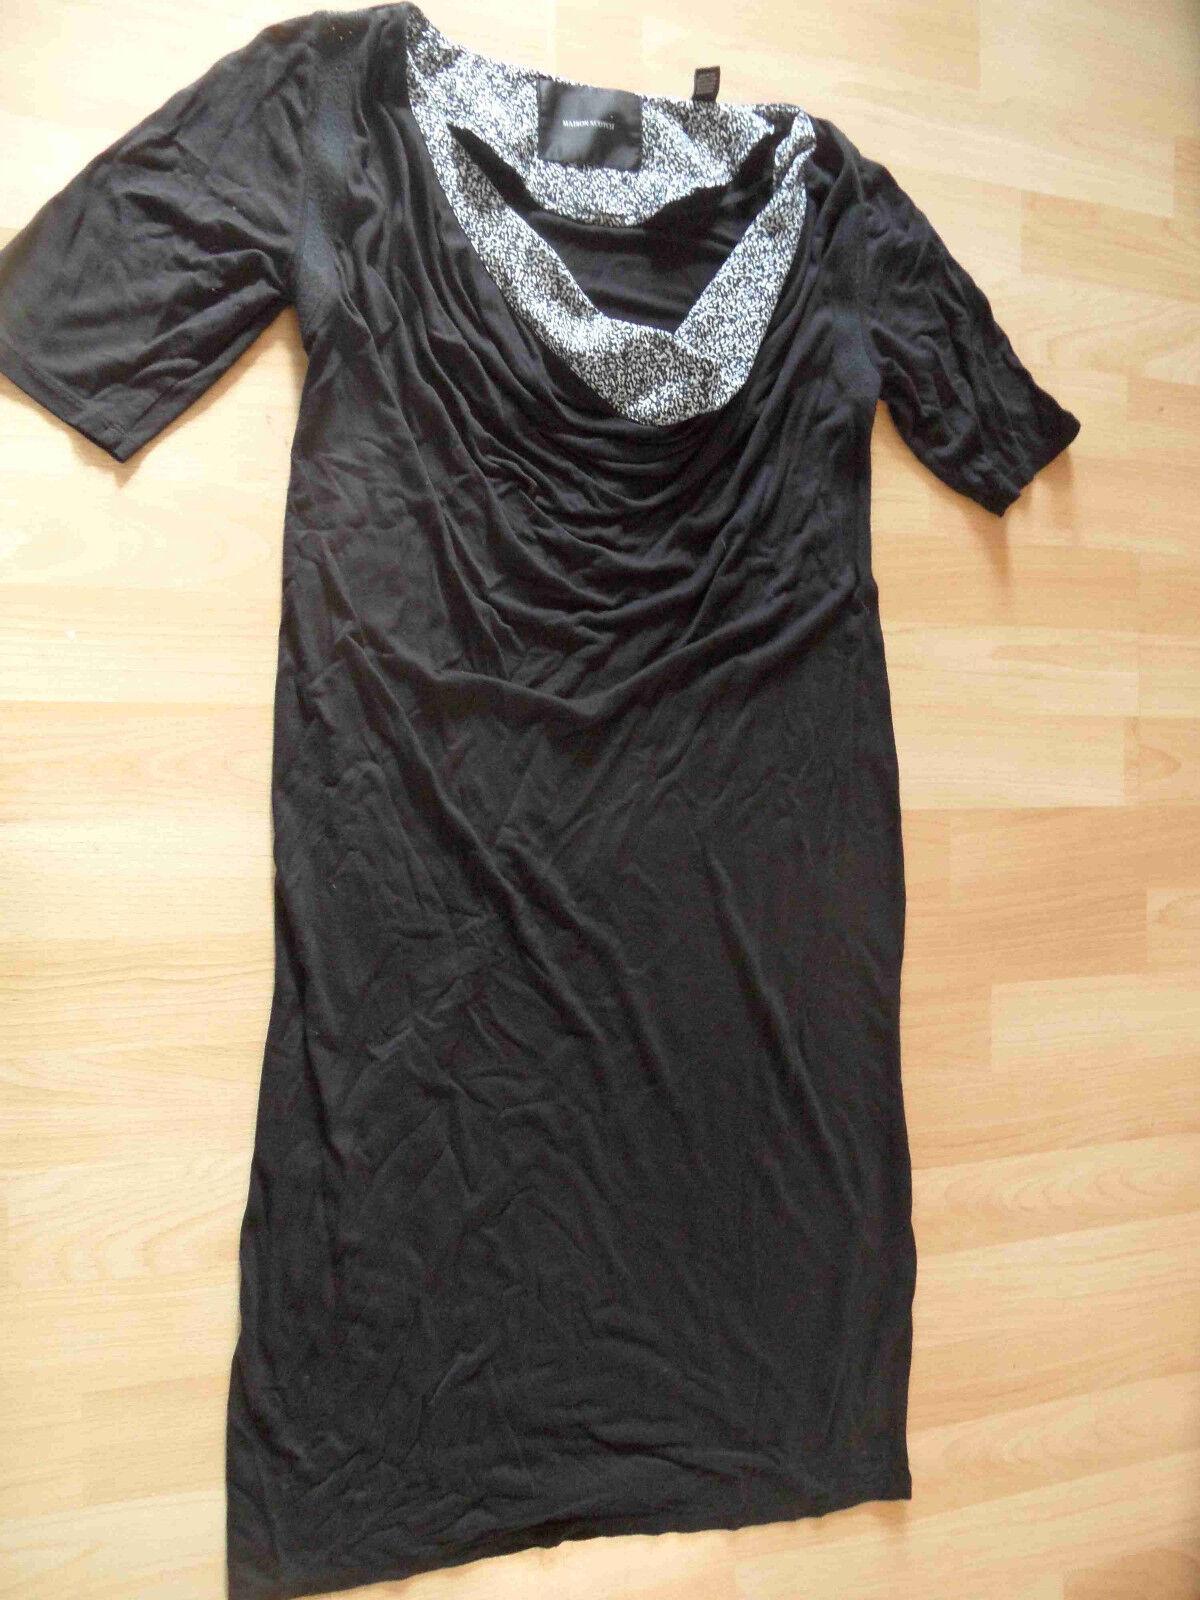 MAISON SCOTCH schönes Jerseykleid Wasserfallausschnitt black Gr. S TOP 816